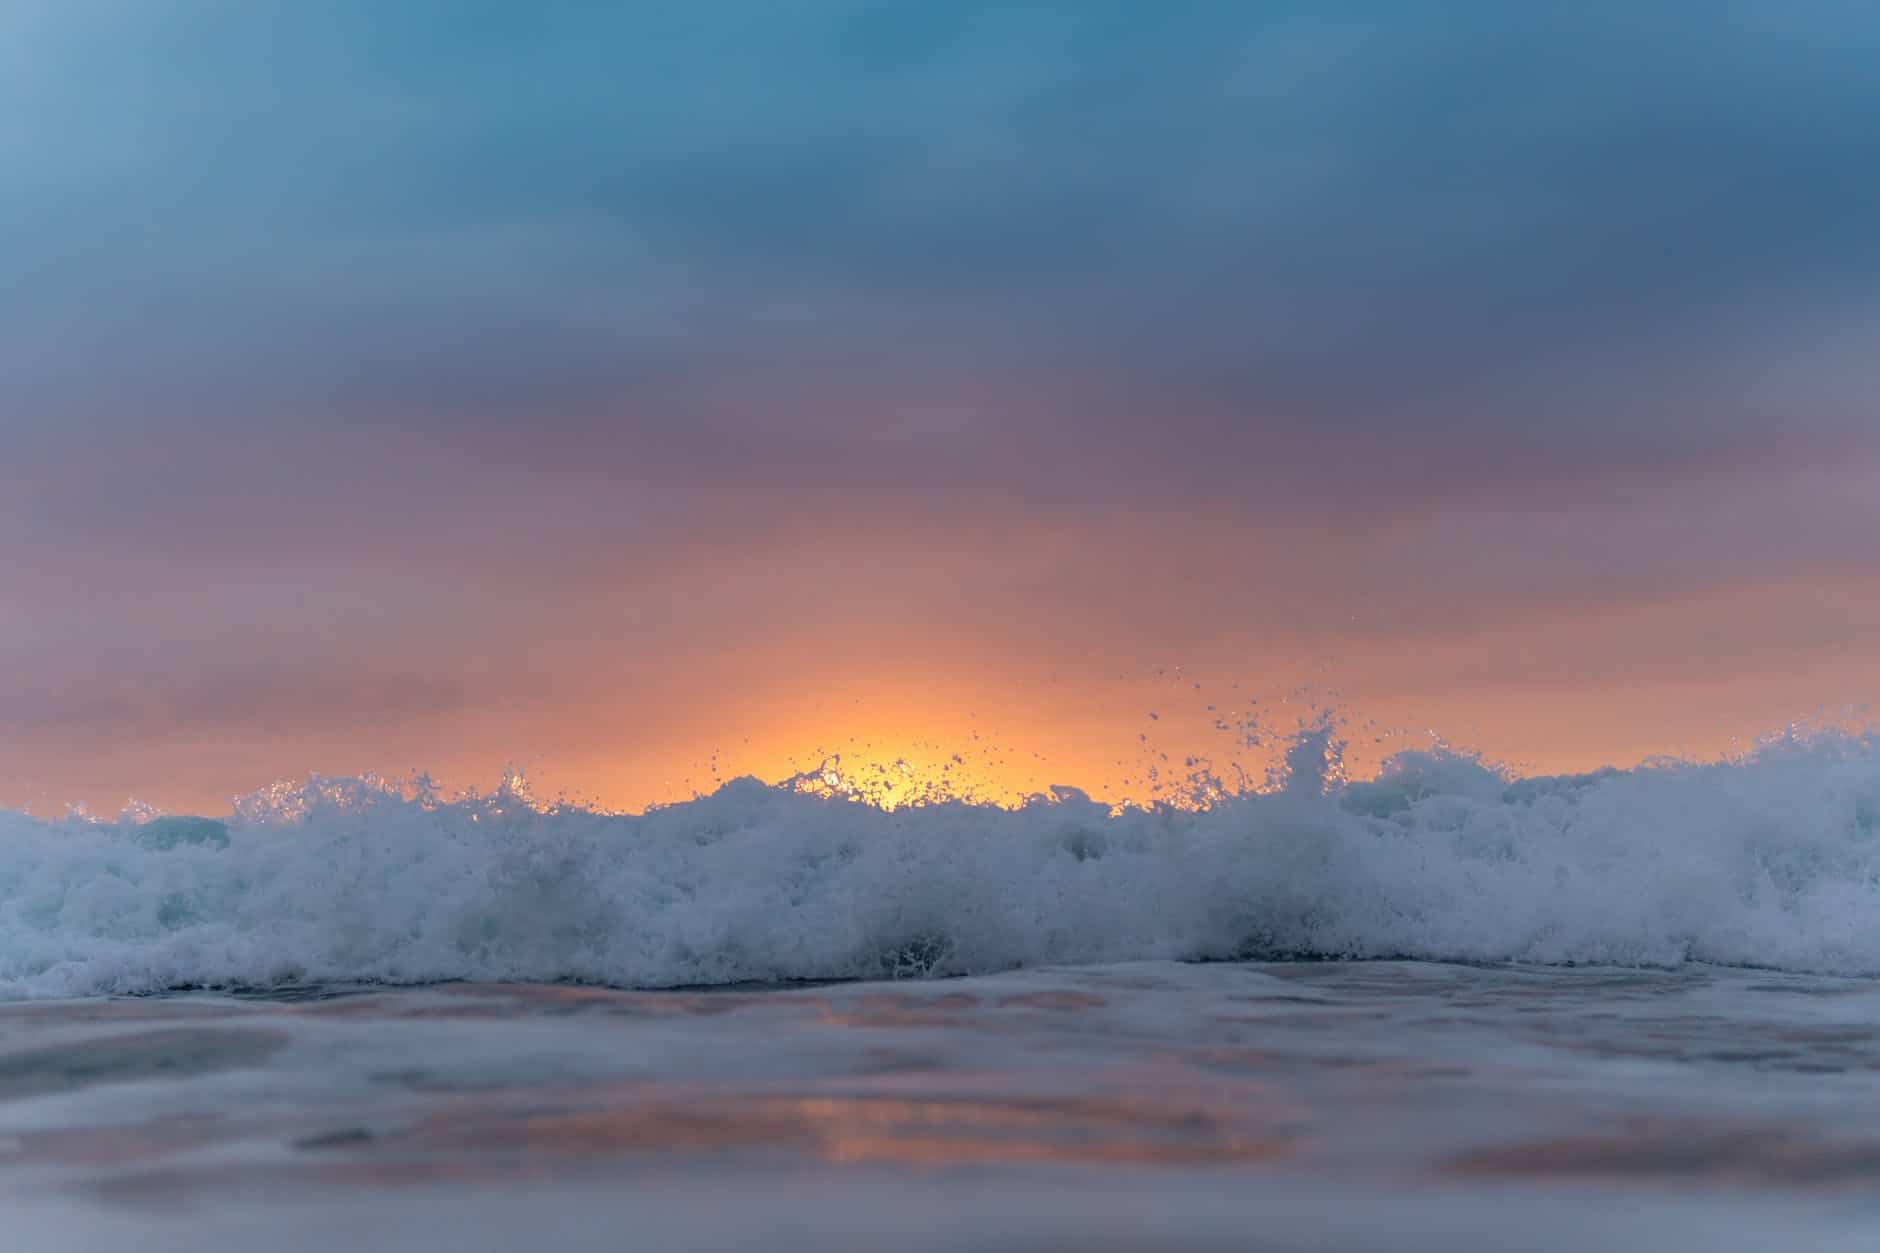 sunset sky over waving sea washing shore